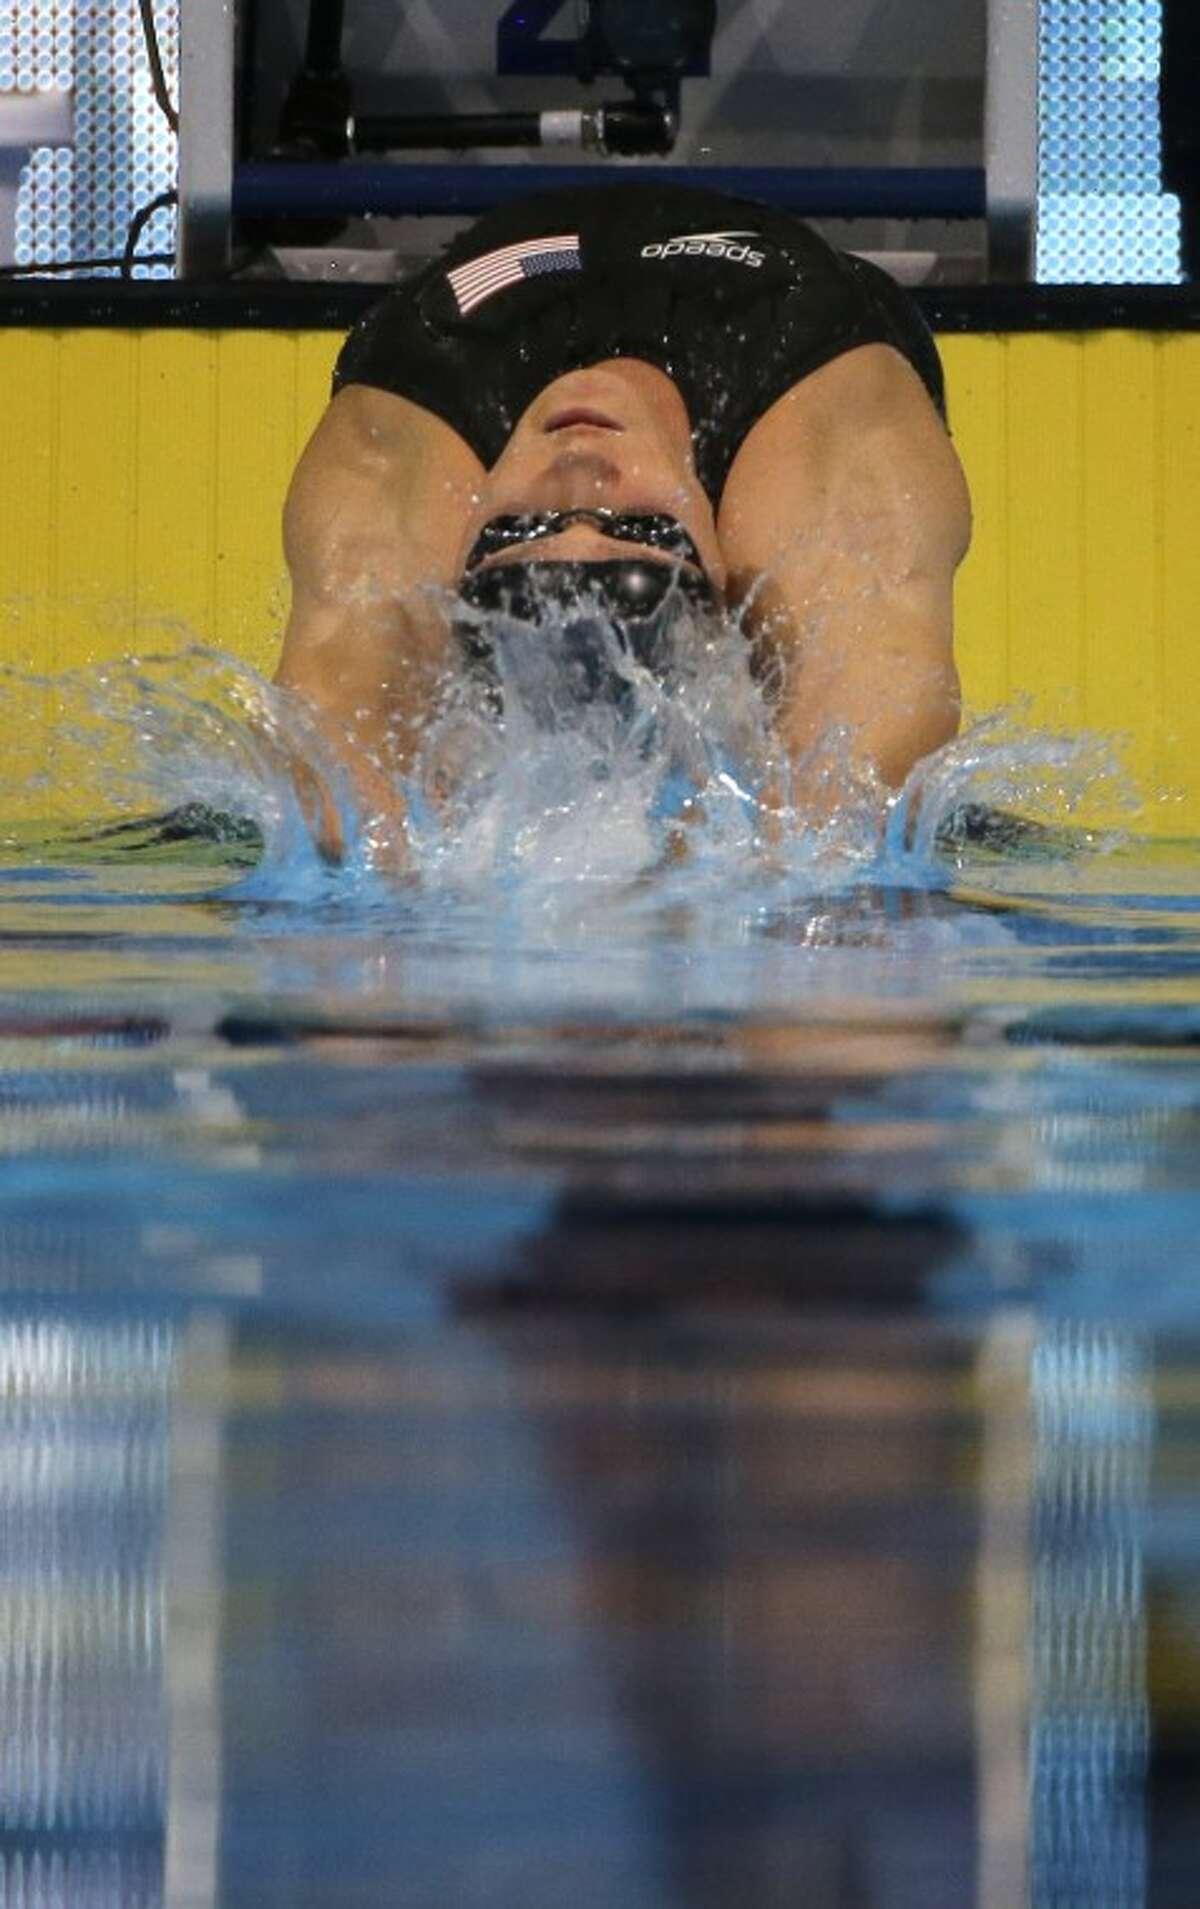 Elizabeth Pelton swims in the women's 200-meter backstroke final at the U.S. Olympic swimming trials on Saturday, June 30, 2012, in Omaha, Neb. (AP Photo/Mark Humphrey)